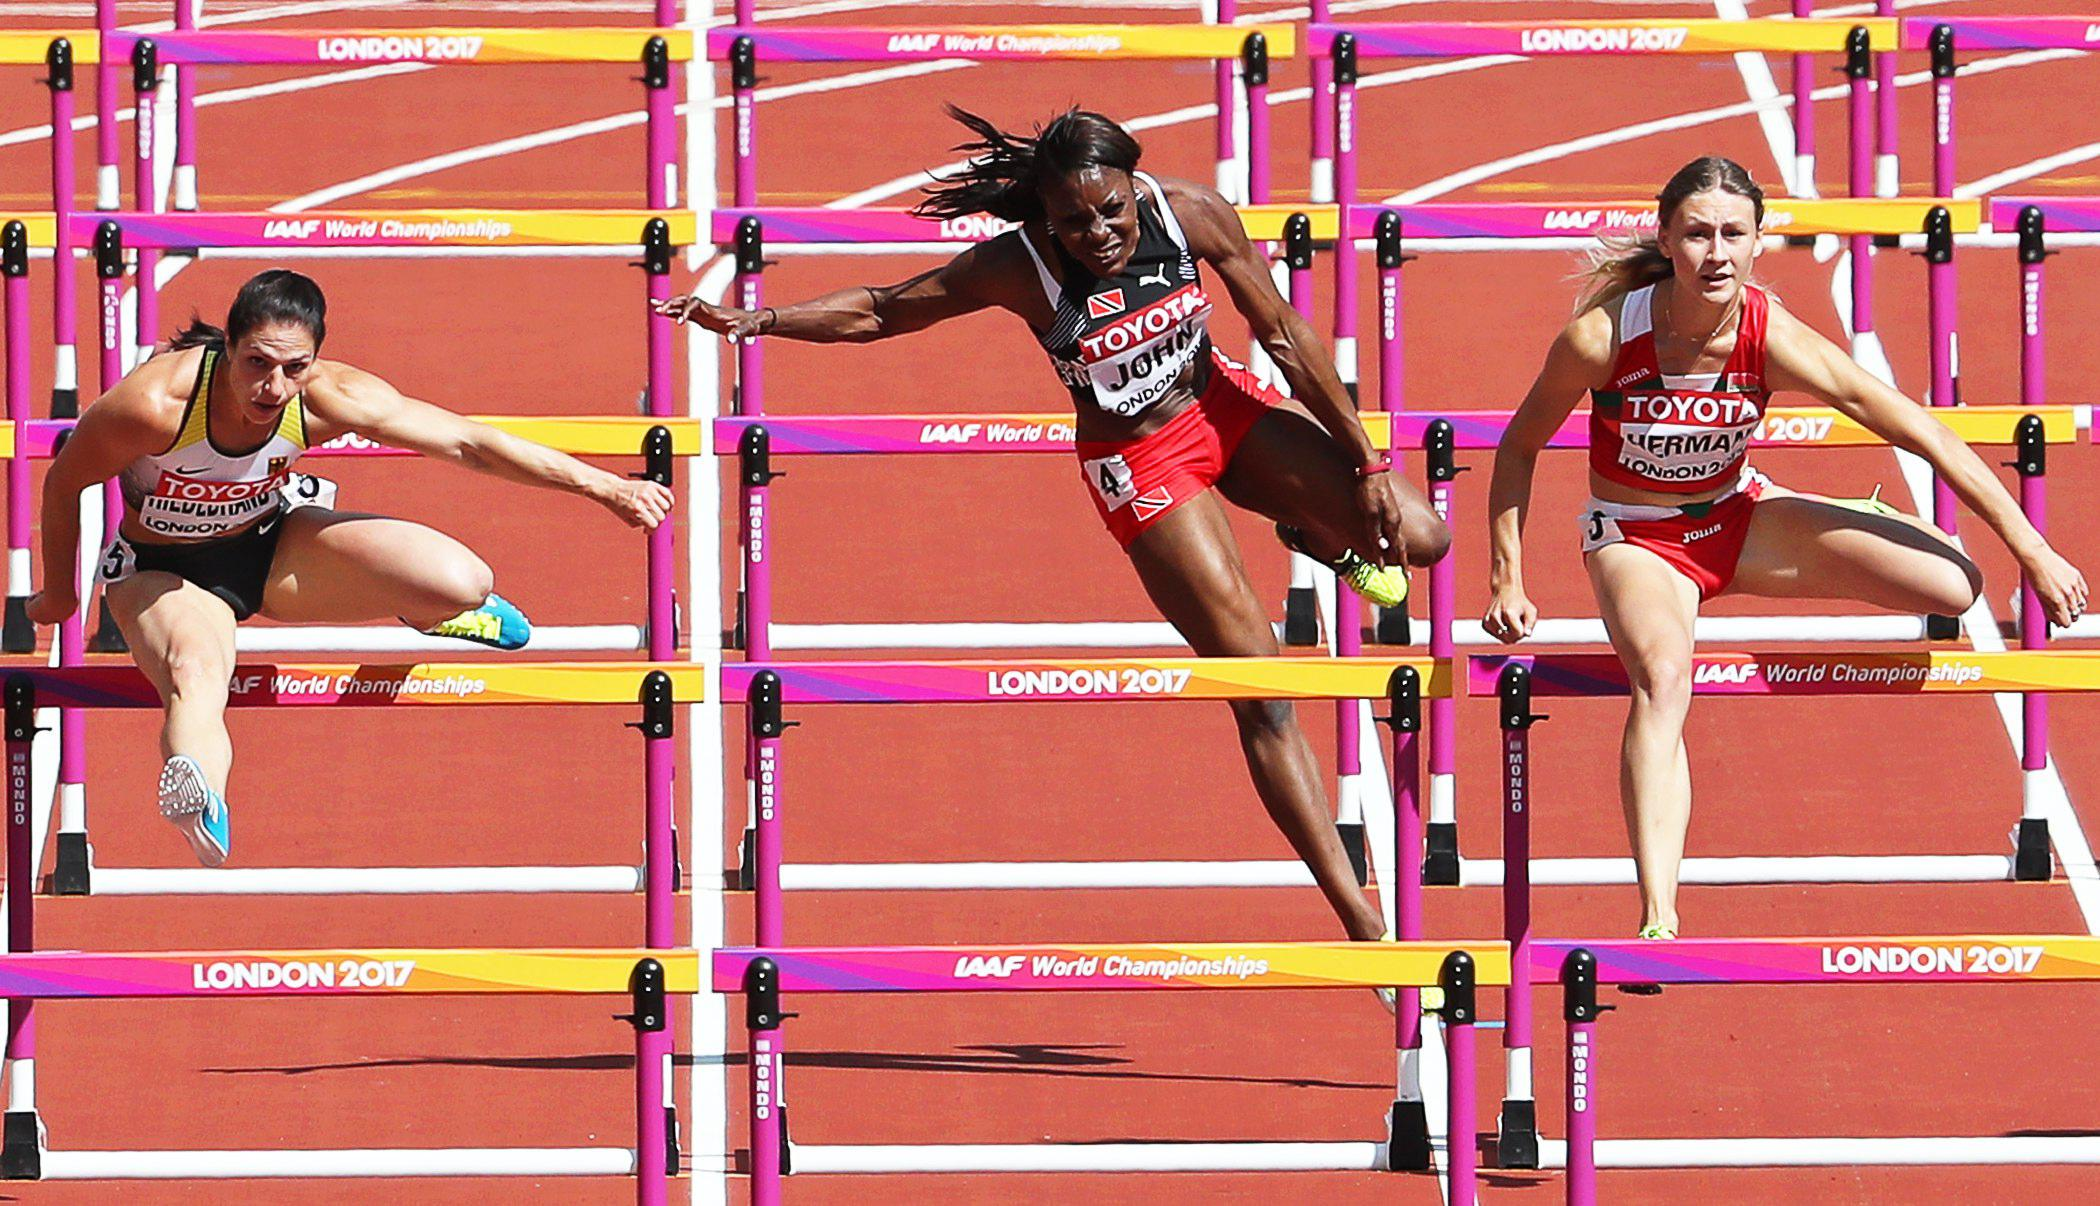 Trinidad and Tobago ace Deborah John hit a hurdle and stayed down after falling